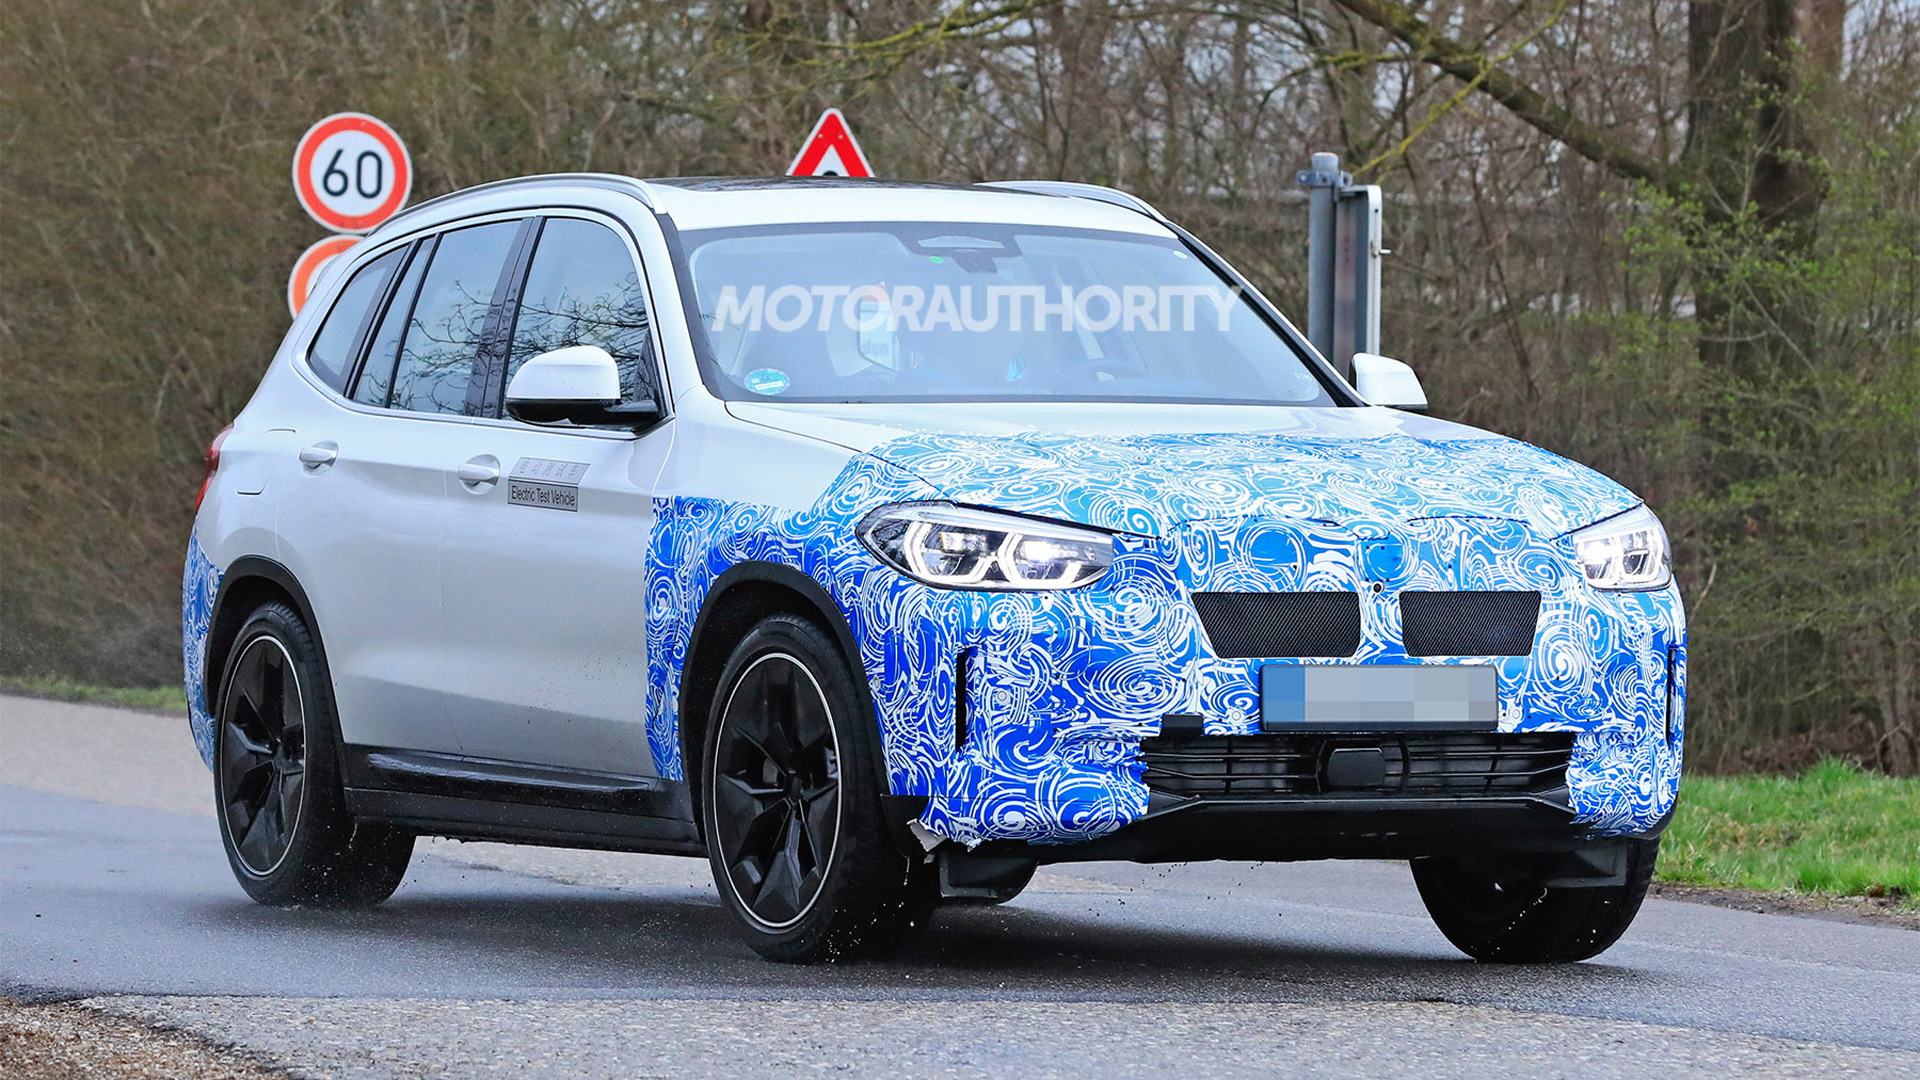 2021 BMW iX3 spy shots - Photo credit:S. Baldauf/SB-Medien